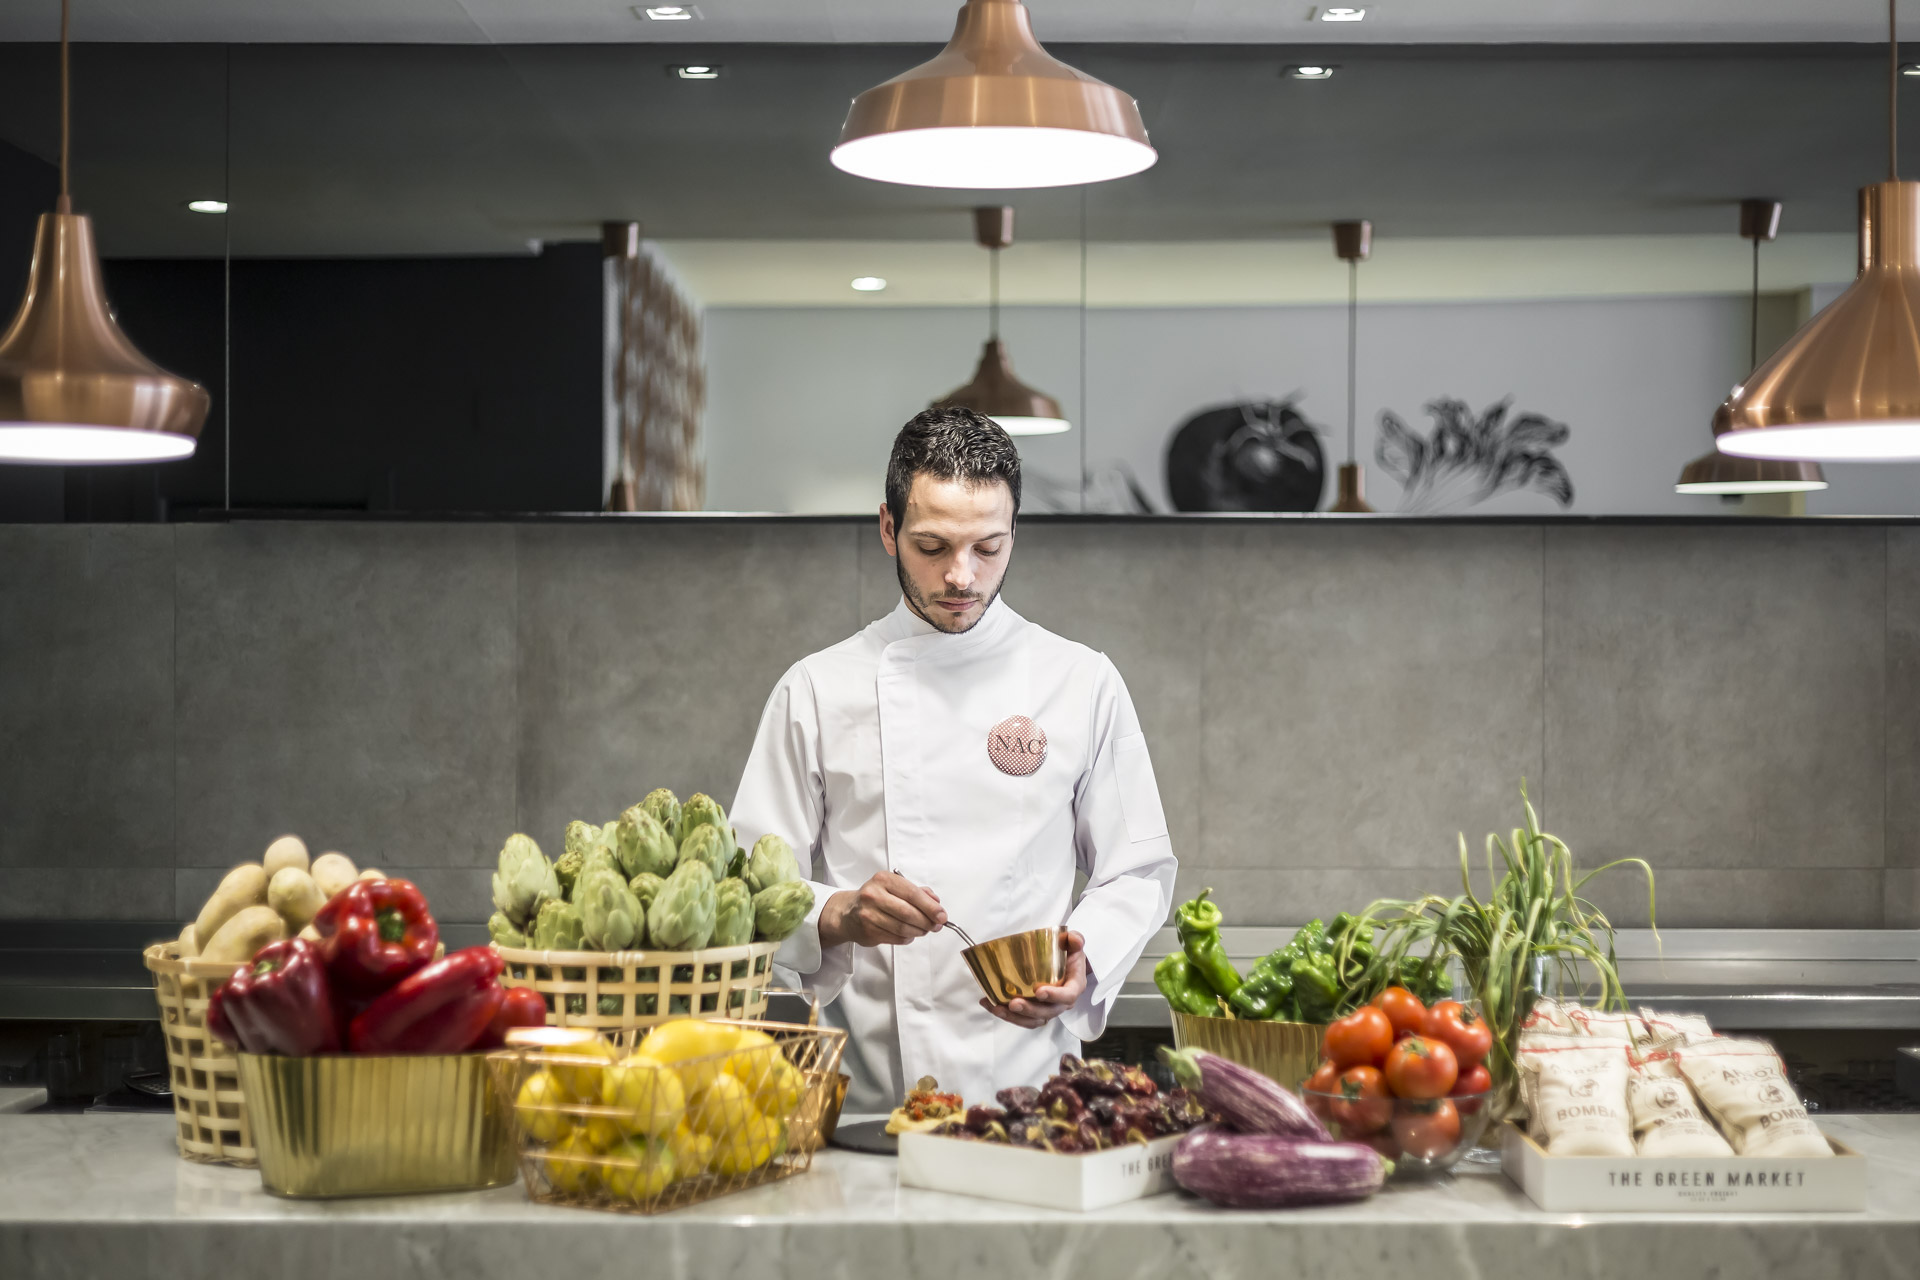 fotografia-arquitectura-valencia-german-cabo-estudihac-restaurante-nac-ontinyent-18